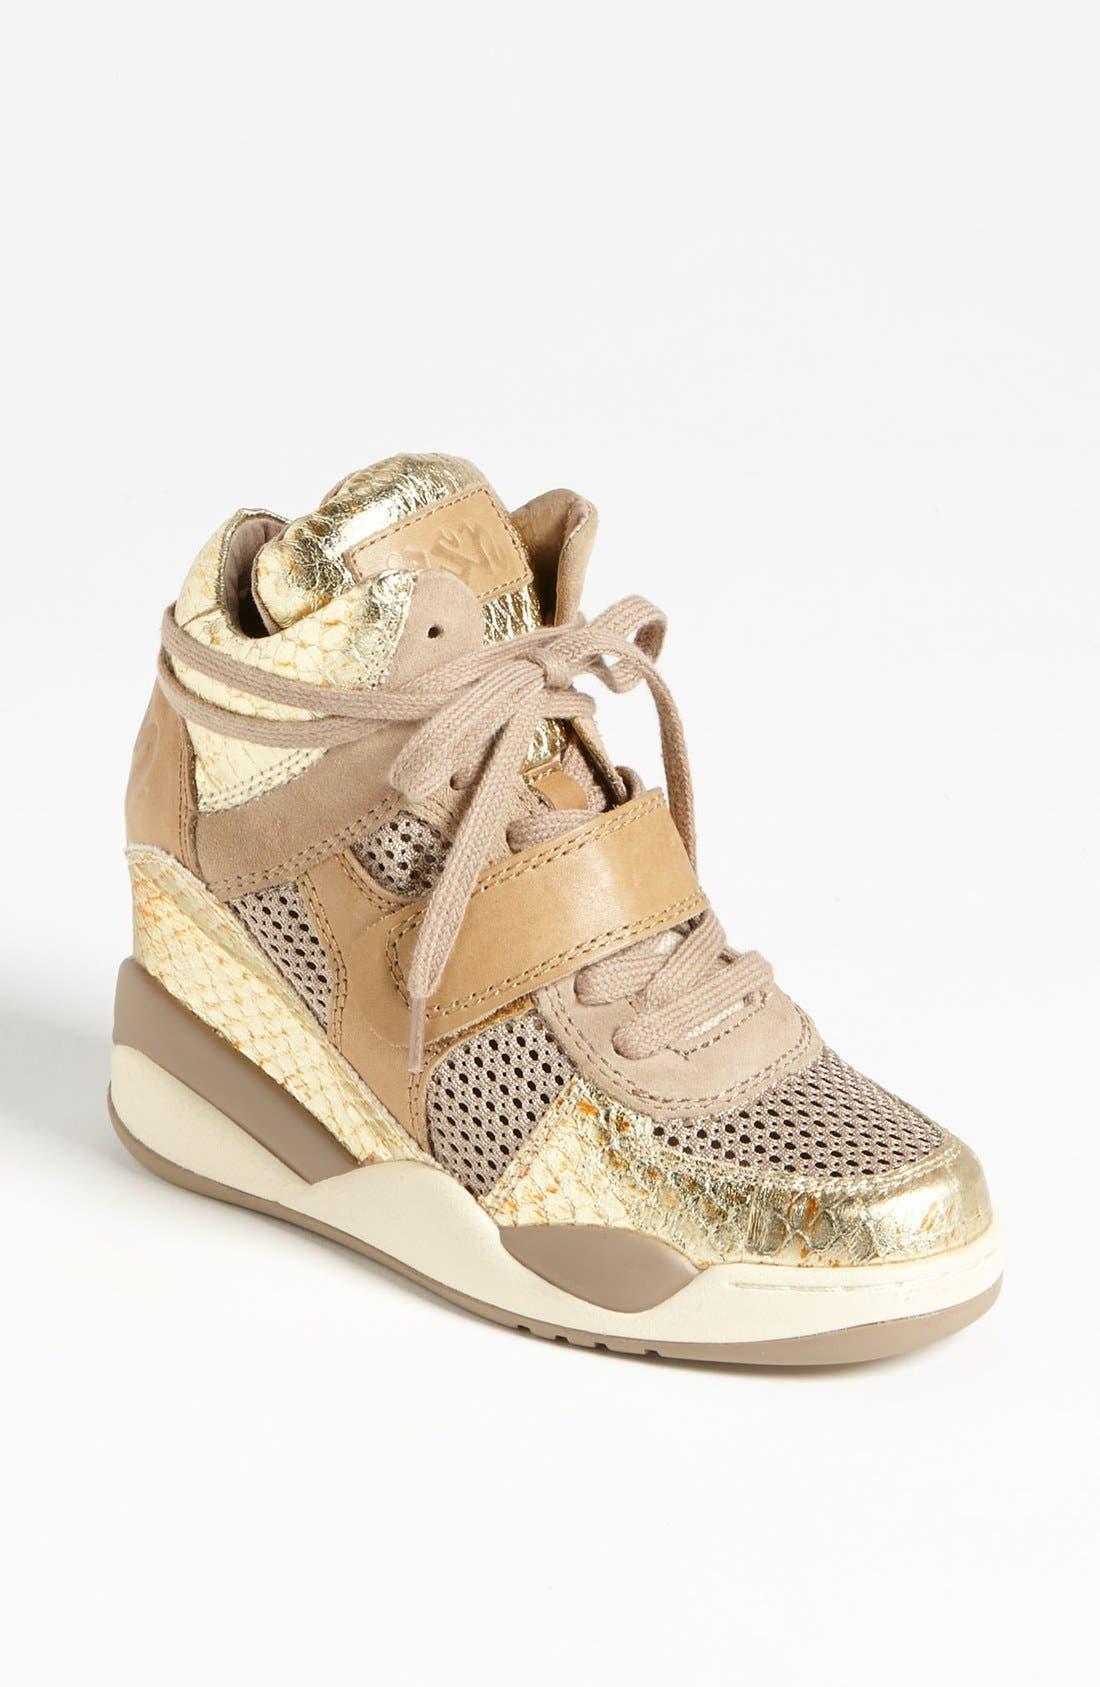 Alternate Image 1 Selected - Ash 'Funky' Sneaker (Nordstrom Exclusive)